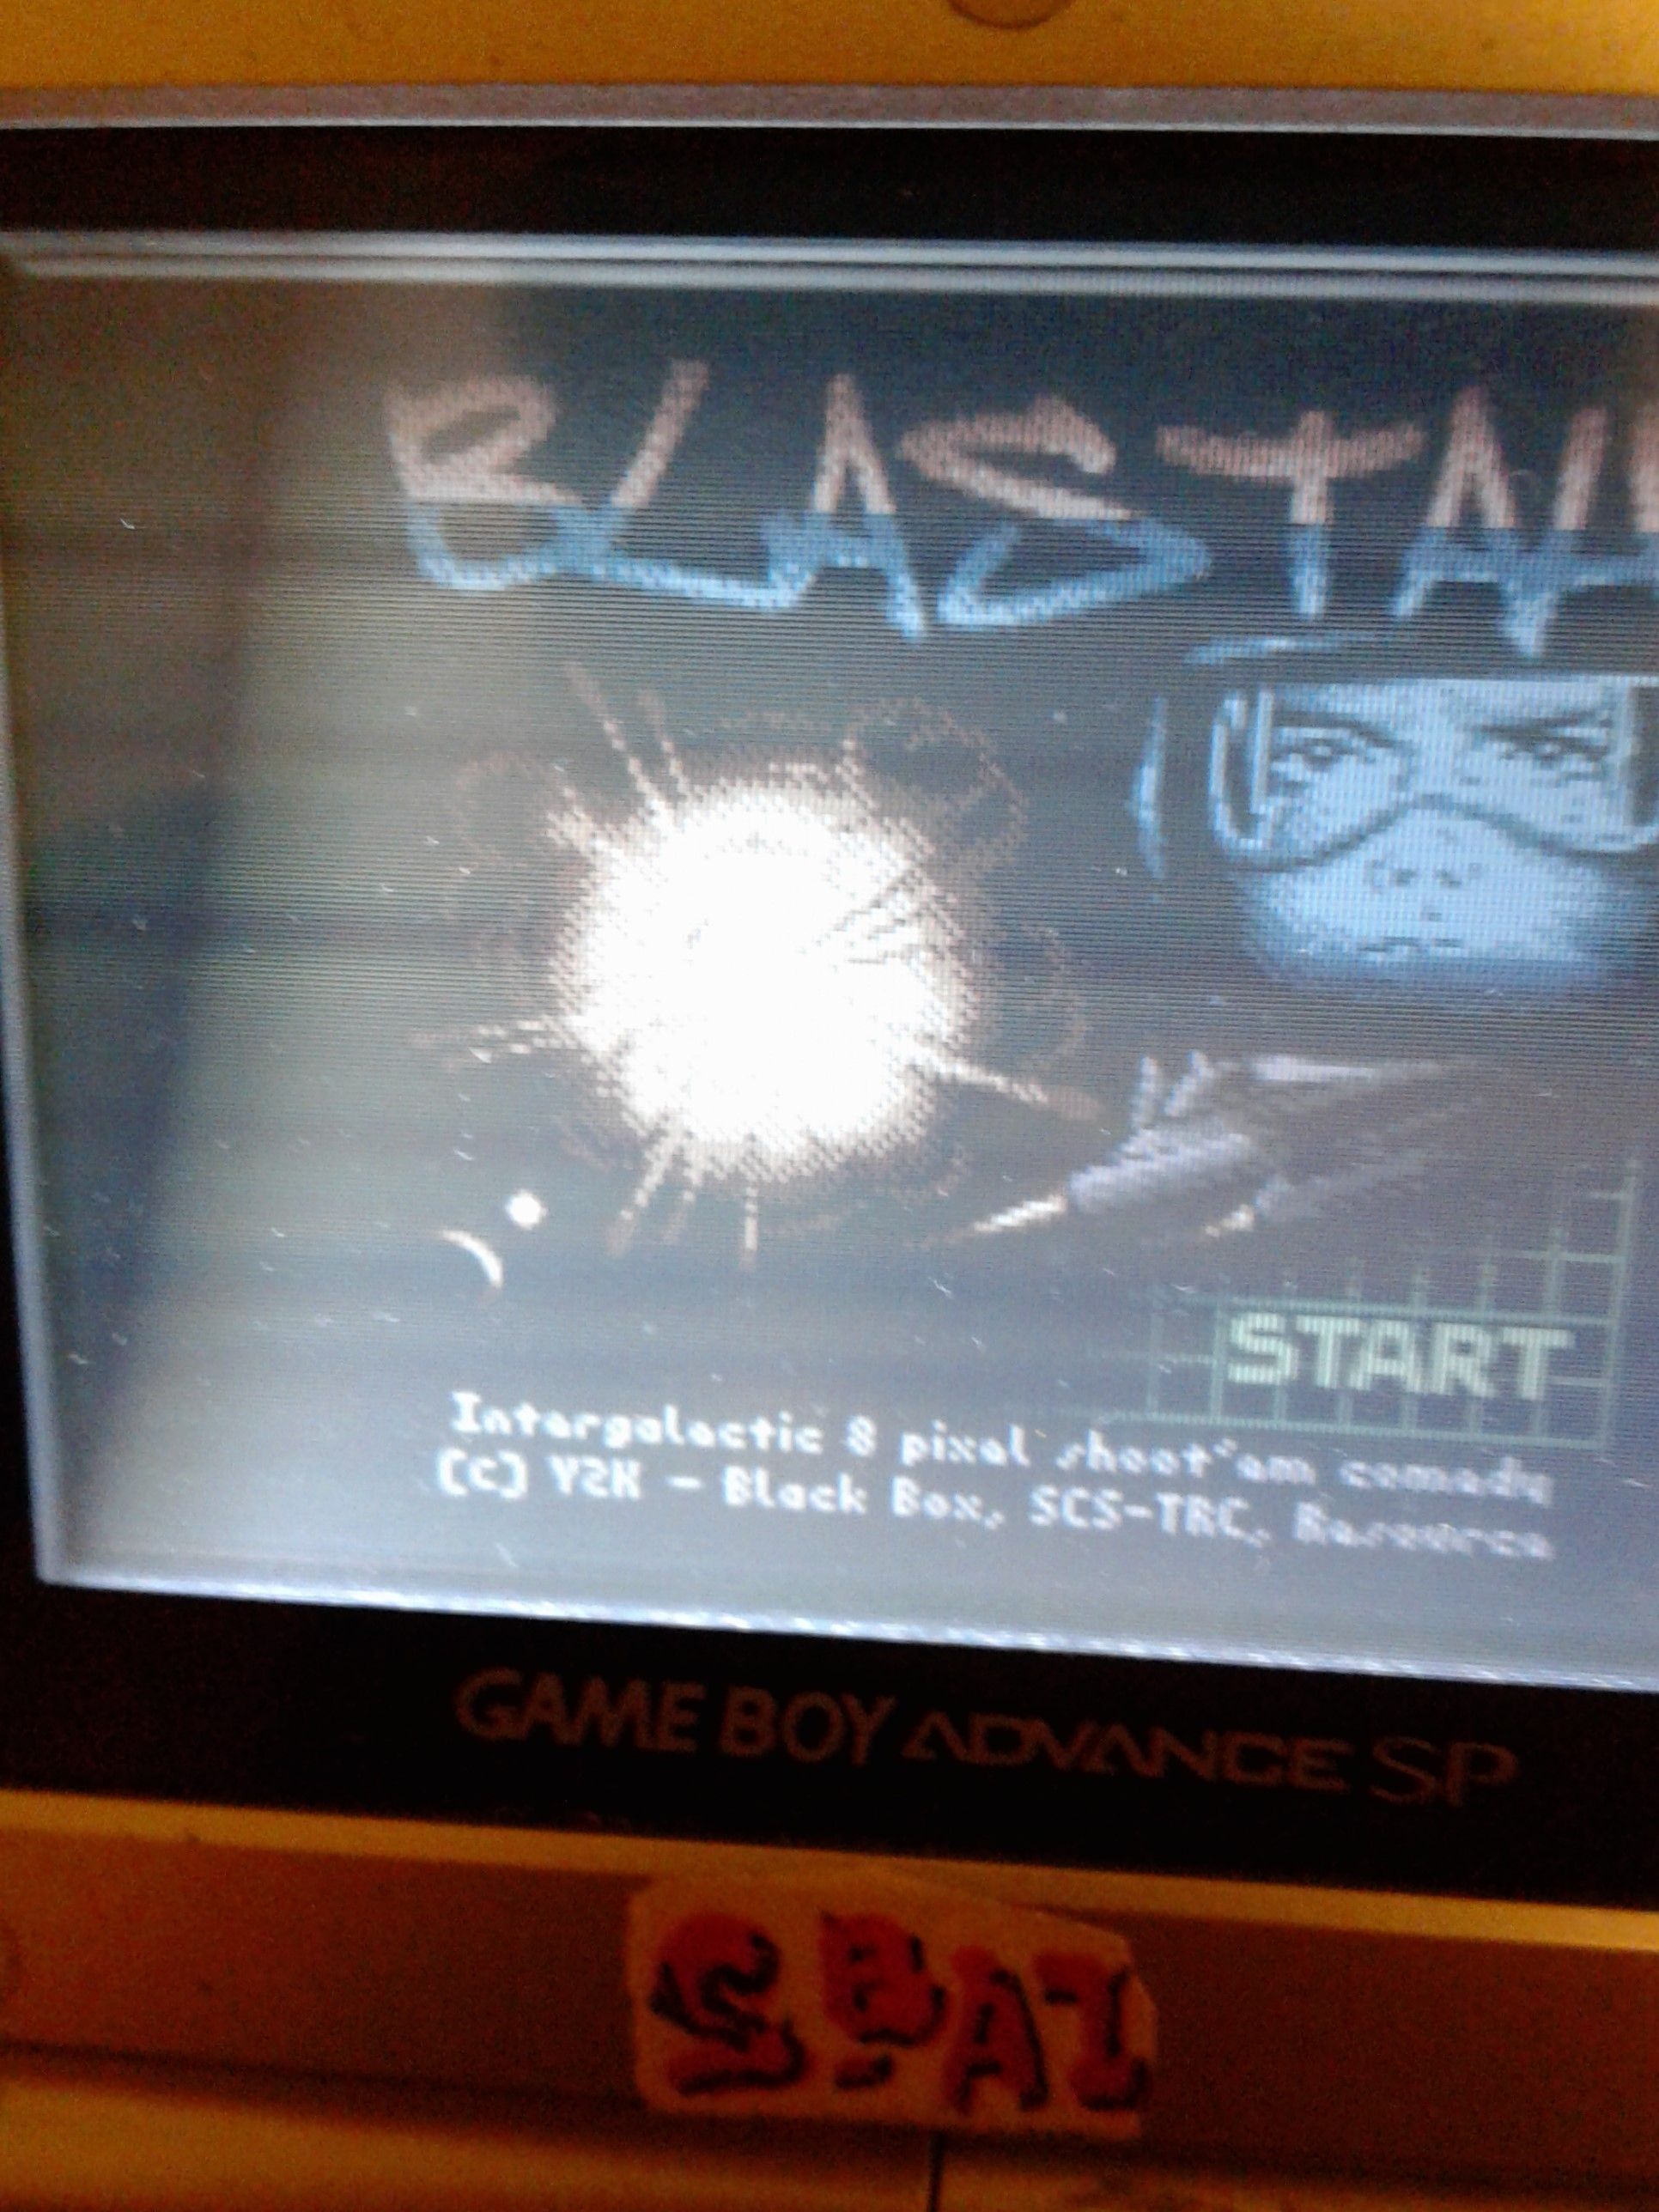 S.BAZ: Blastah (Game Boy Color) 1,400 points on 2020-08-08 16:33:56